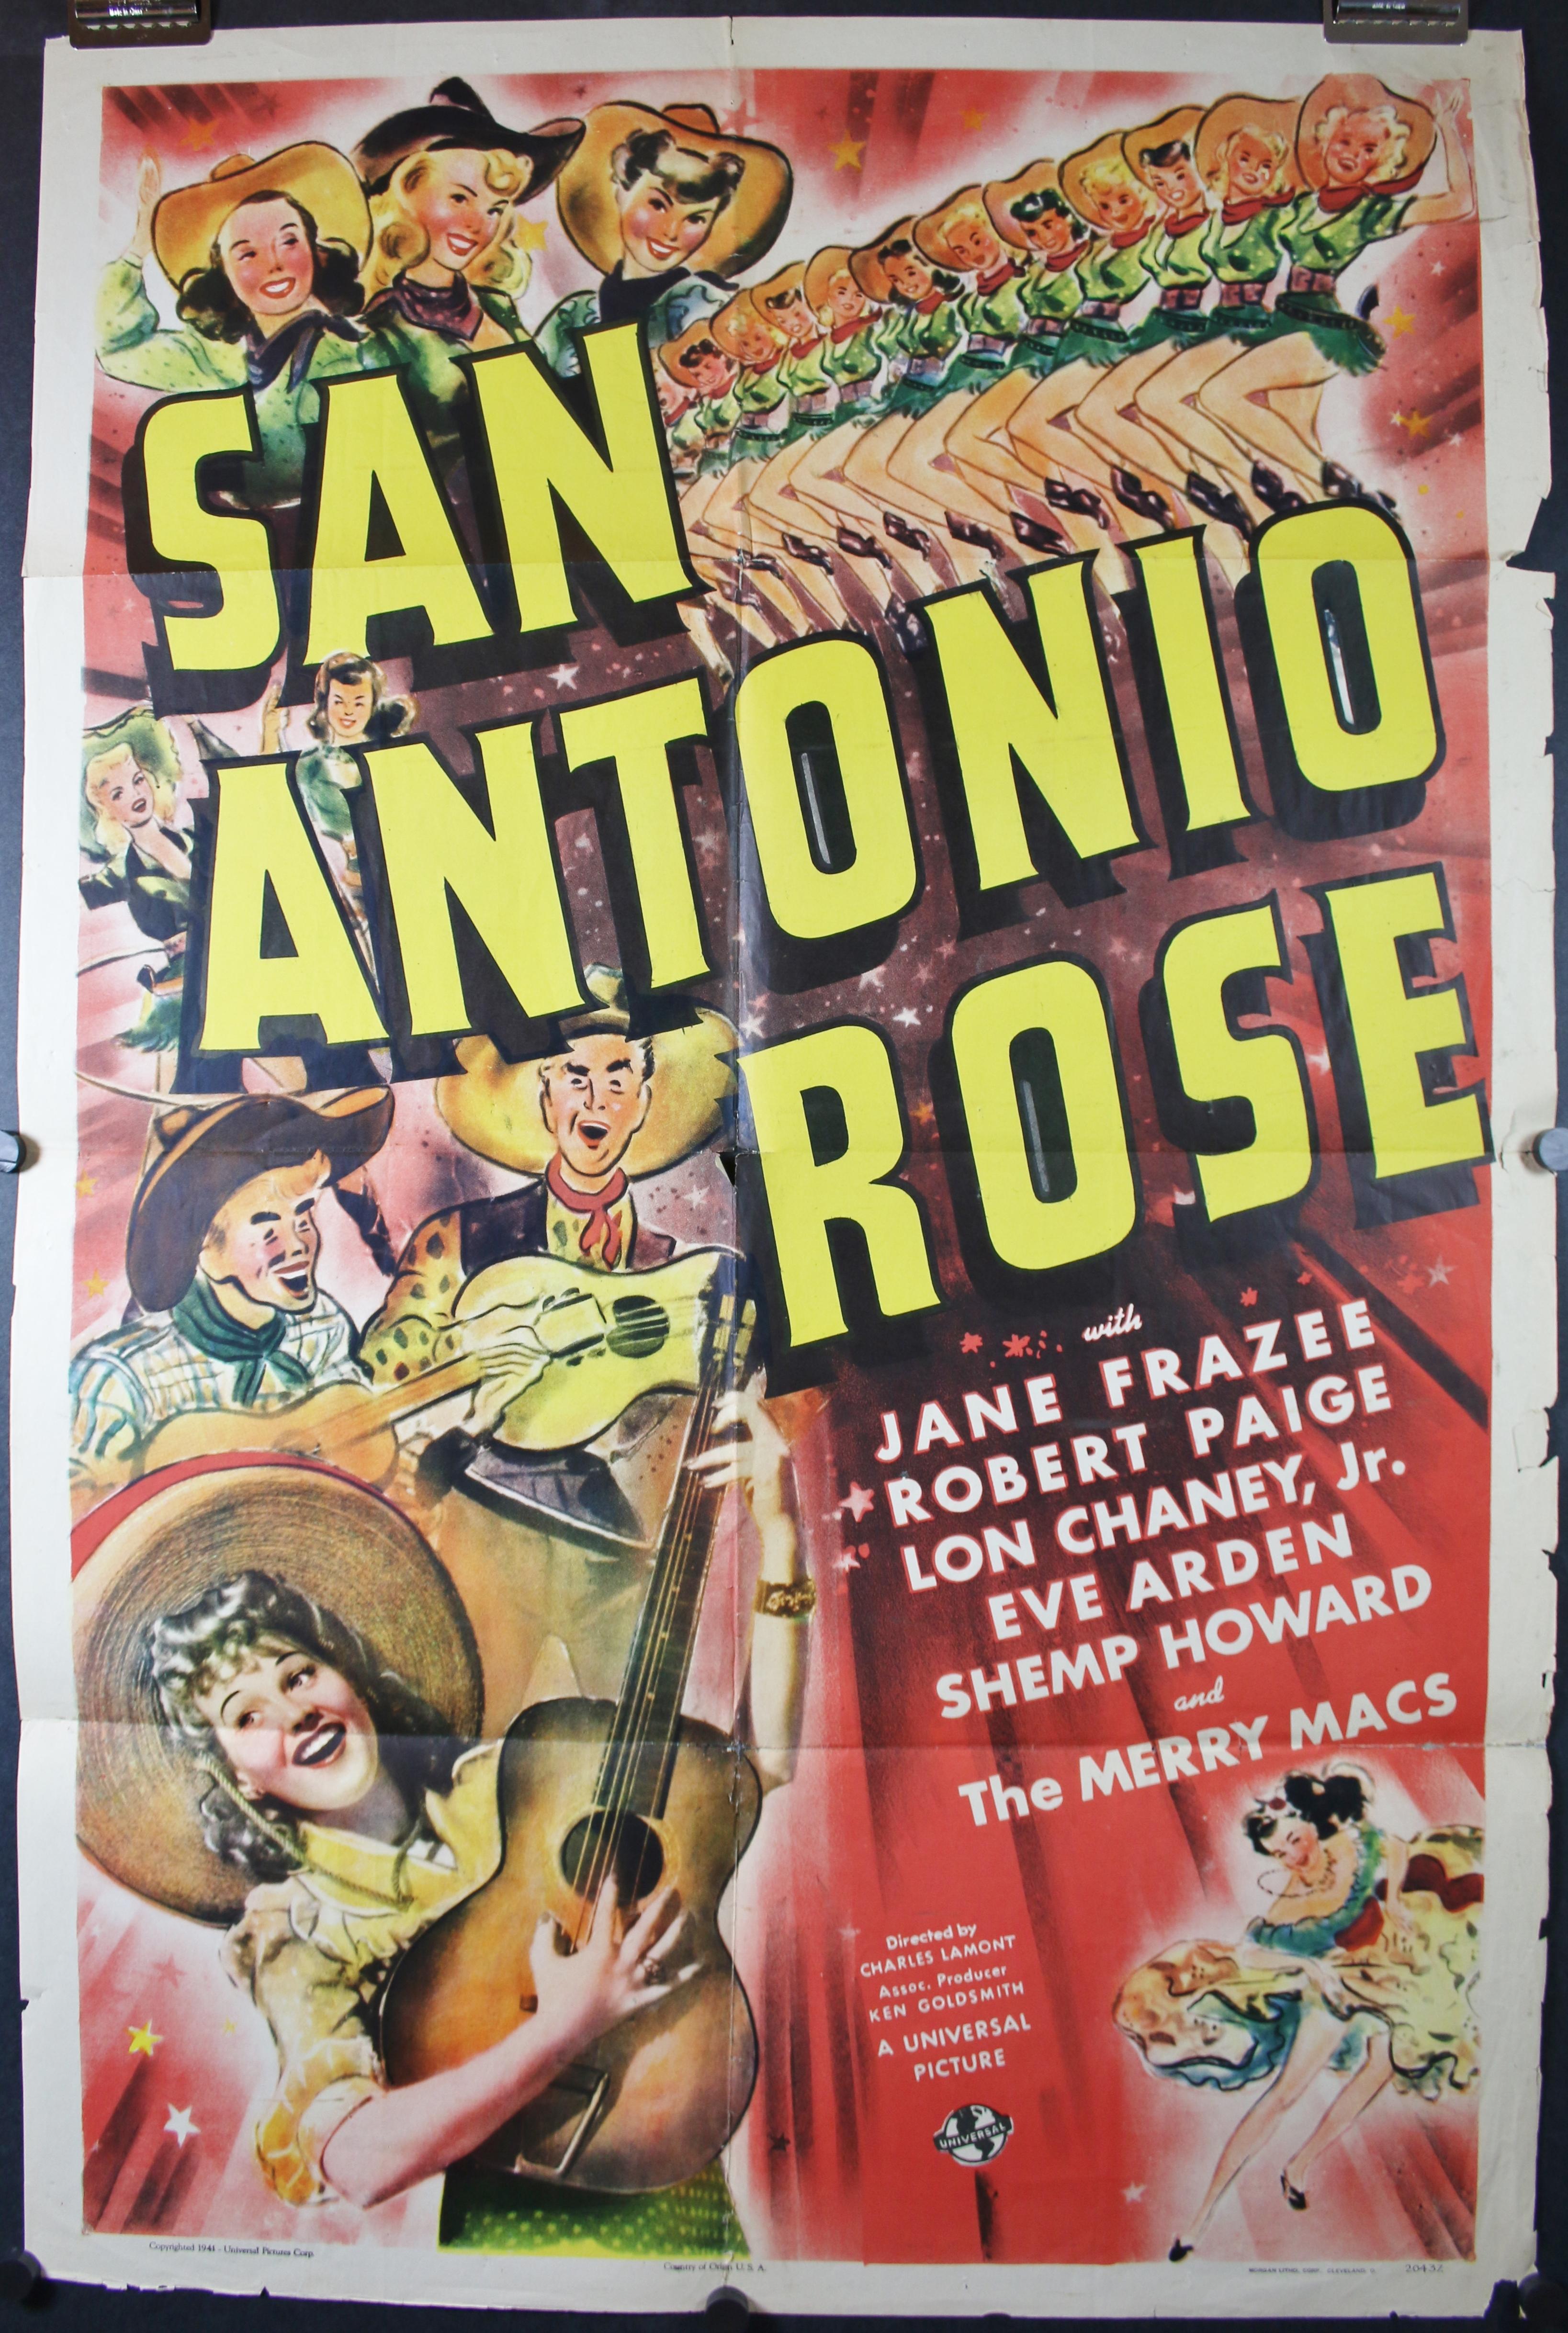 San Antonio Rose 4747